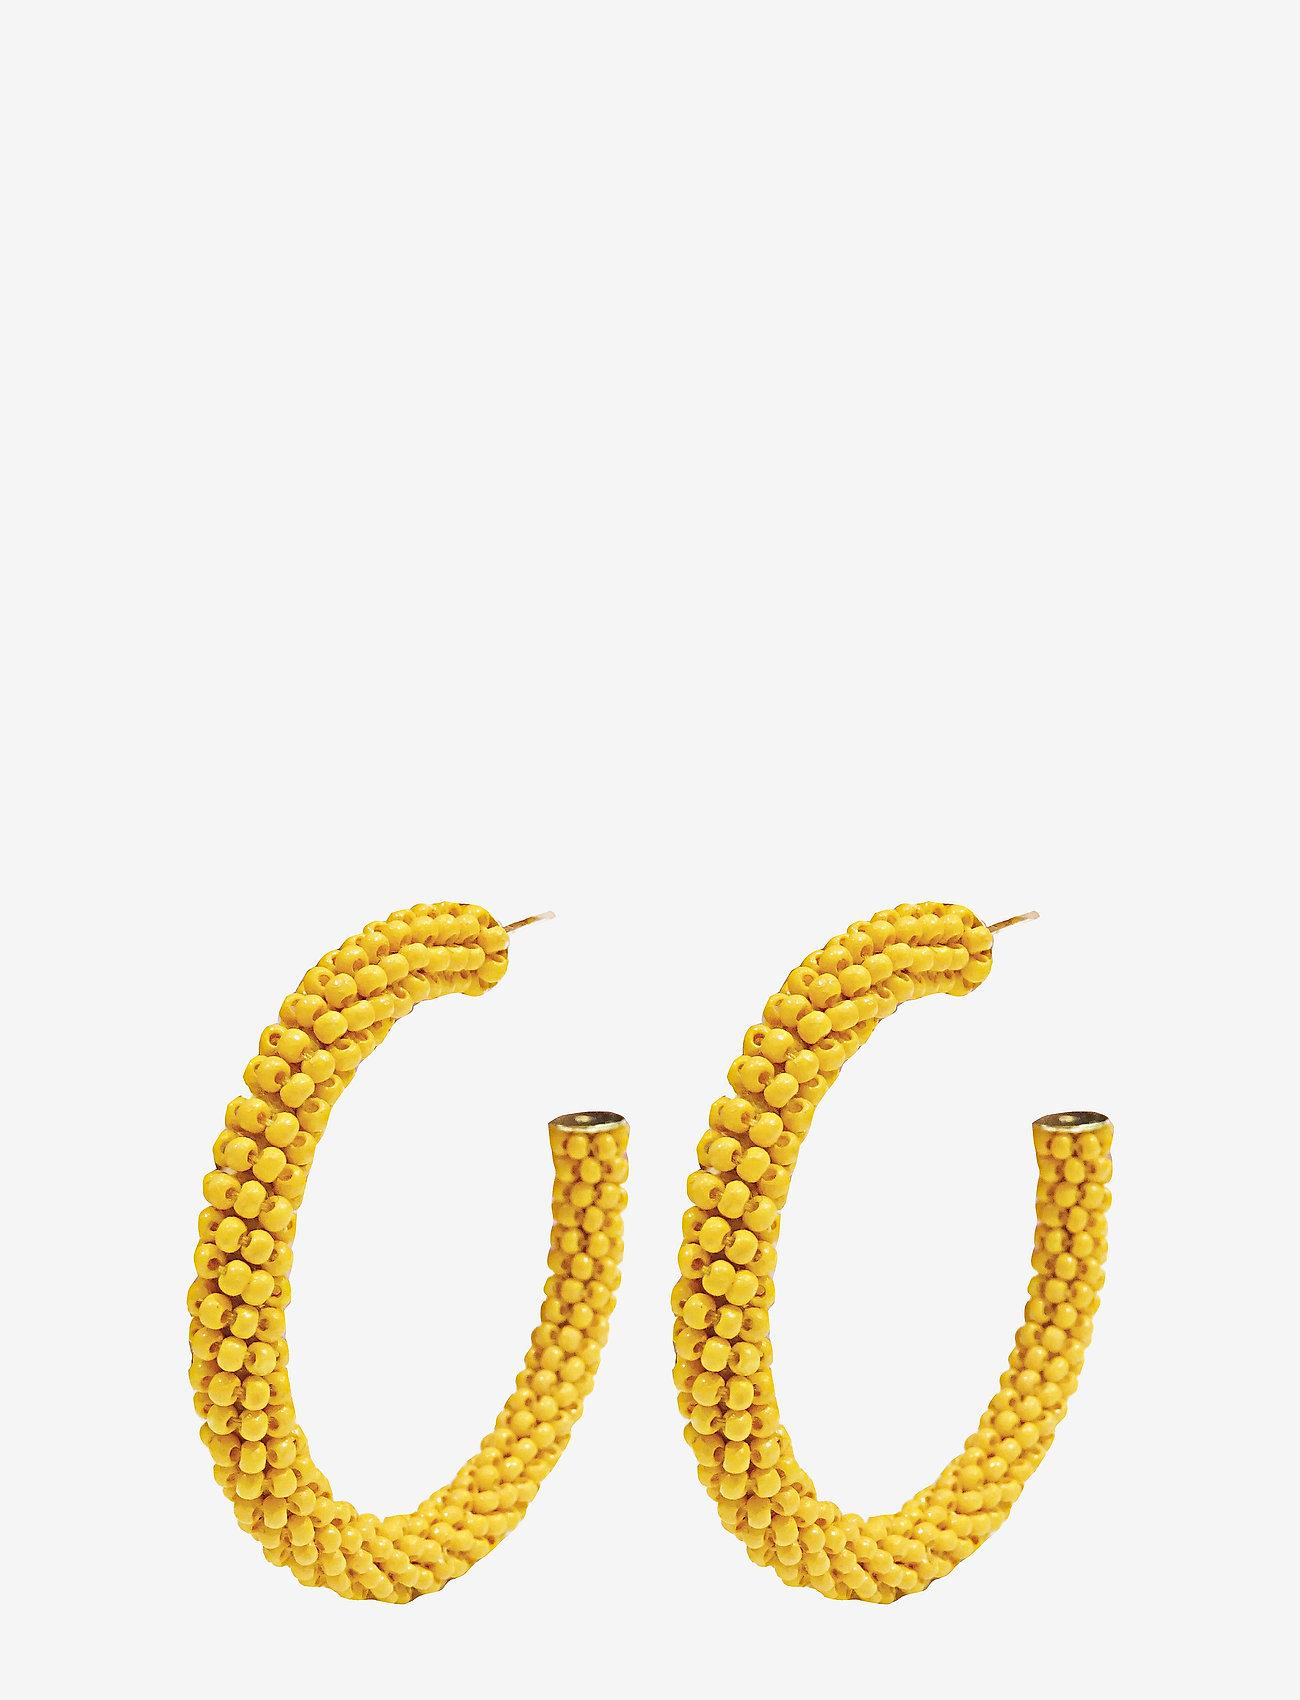 PIPOL'S BAZAAR - Dany Beaded PIPOL Hoop Yellow - hoops - yellow